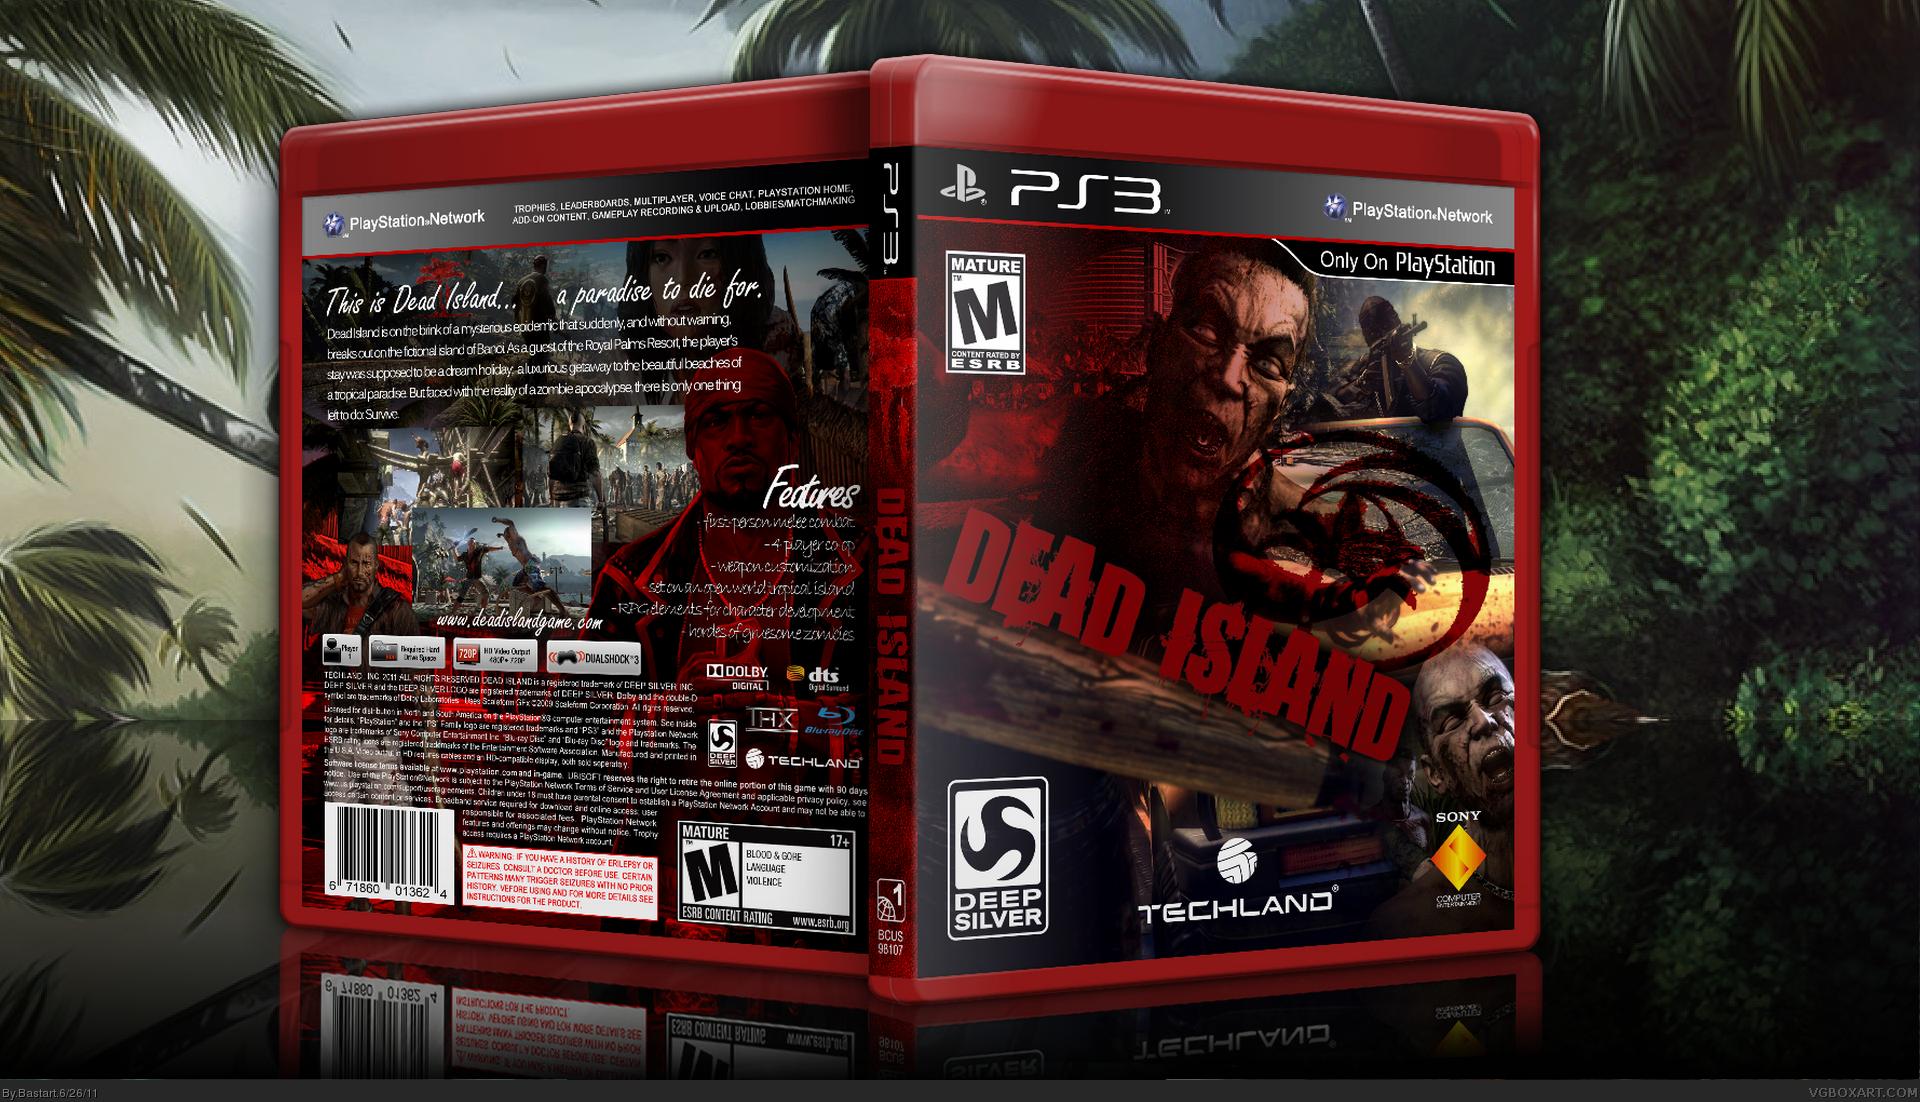 dead island playstation 3 box art cover by bastart